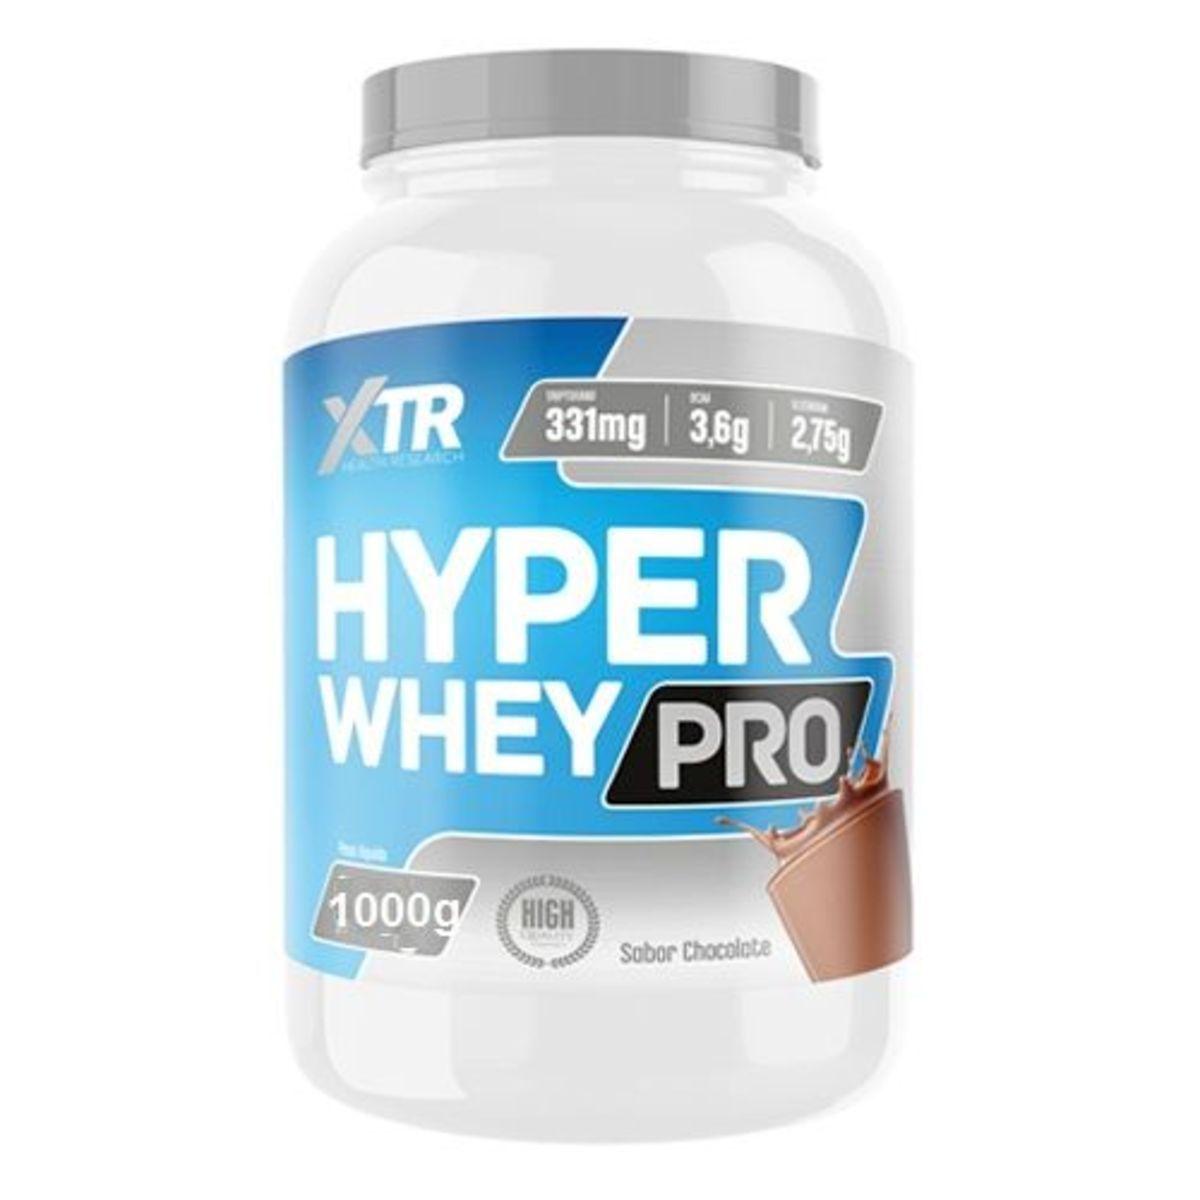 Hyper Whey Pro Sabor Chocolate